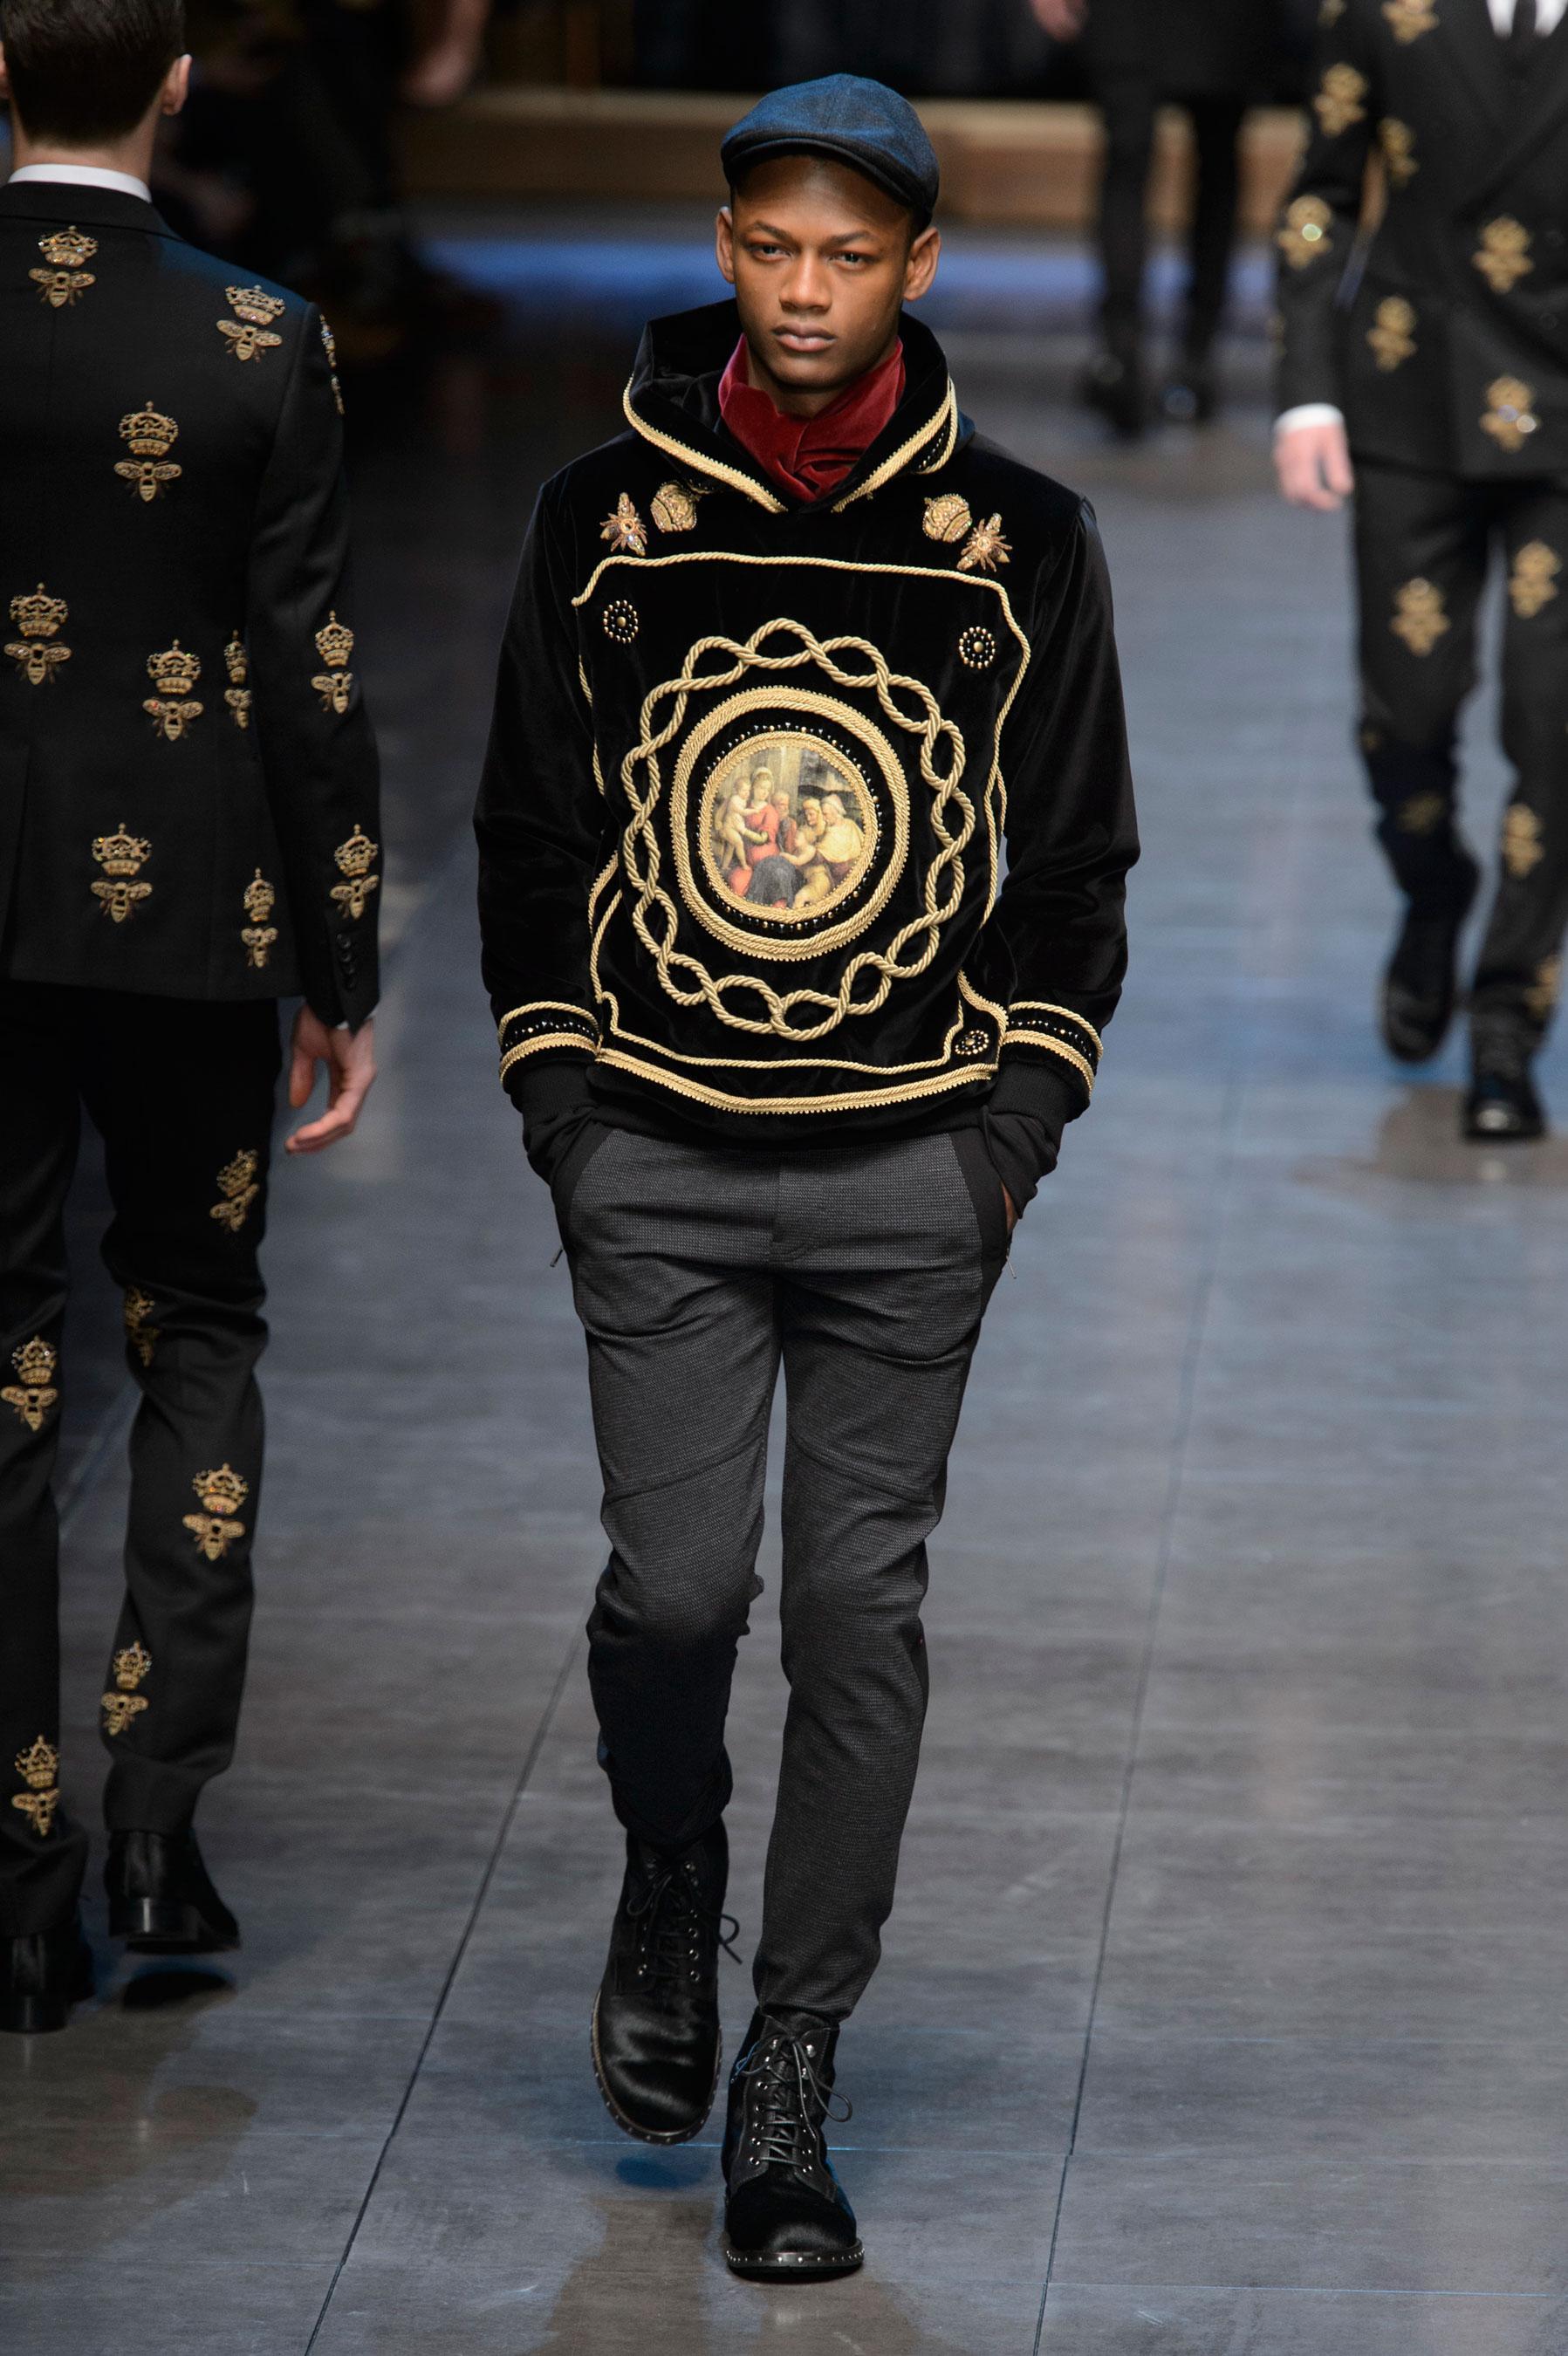 83ae371cedaa Défilé Dolce   Gabbana Automne-hiver 2015-2016 Homme - Madame Figaro